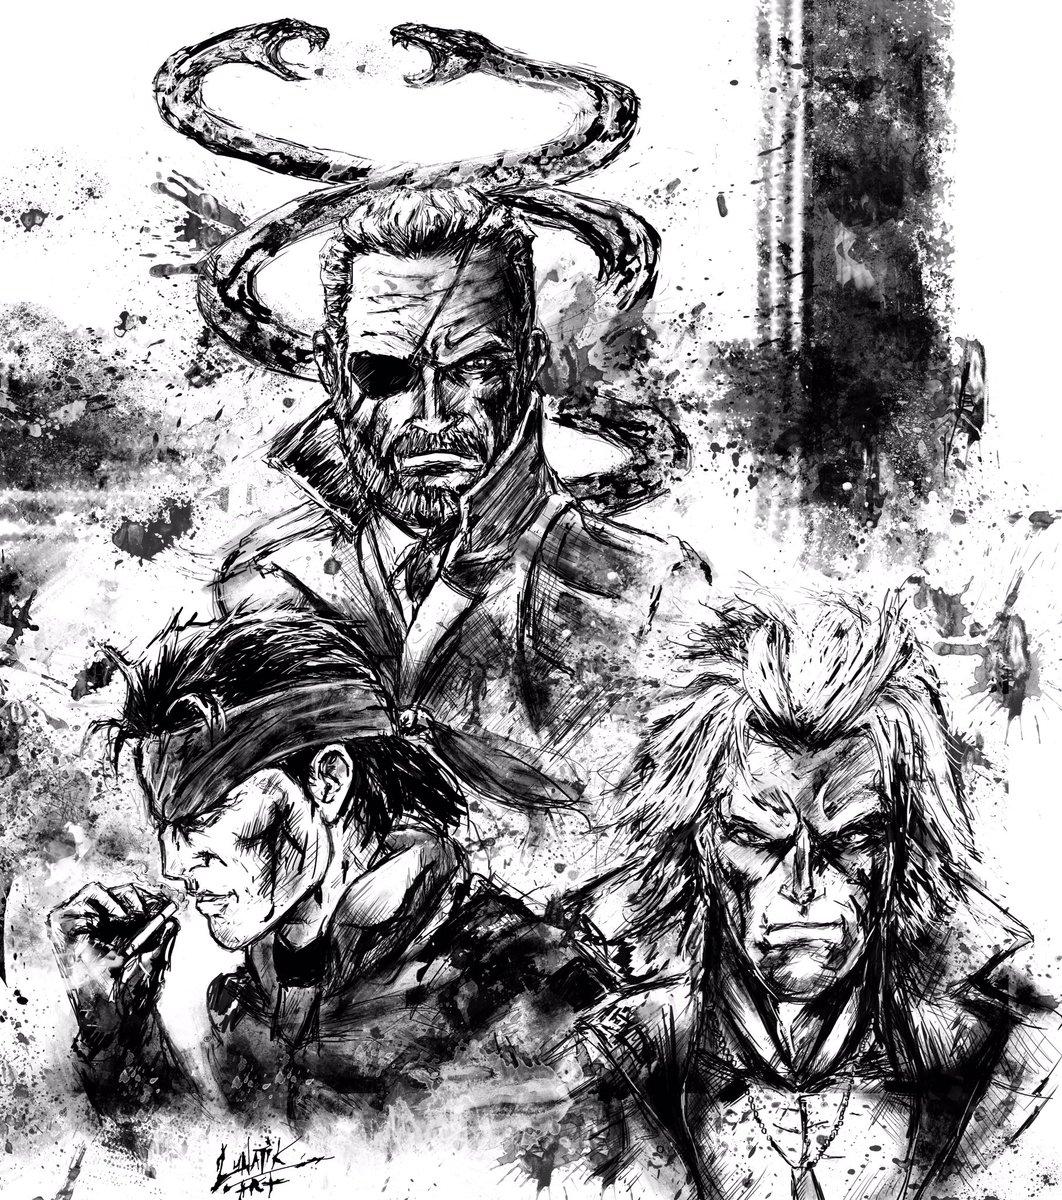 Art Of Lunatik On Twitter Still Celebrating Metalgear31st